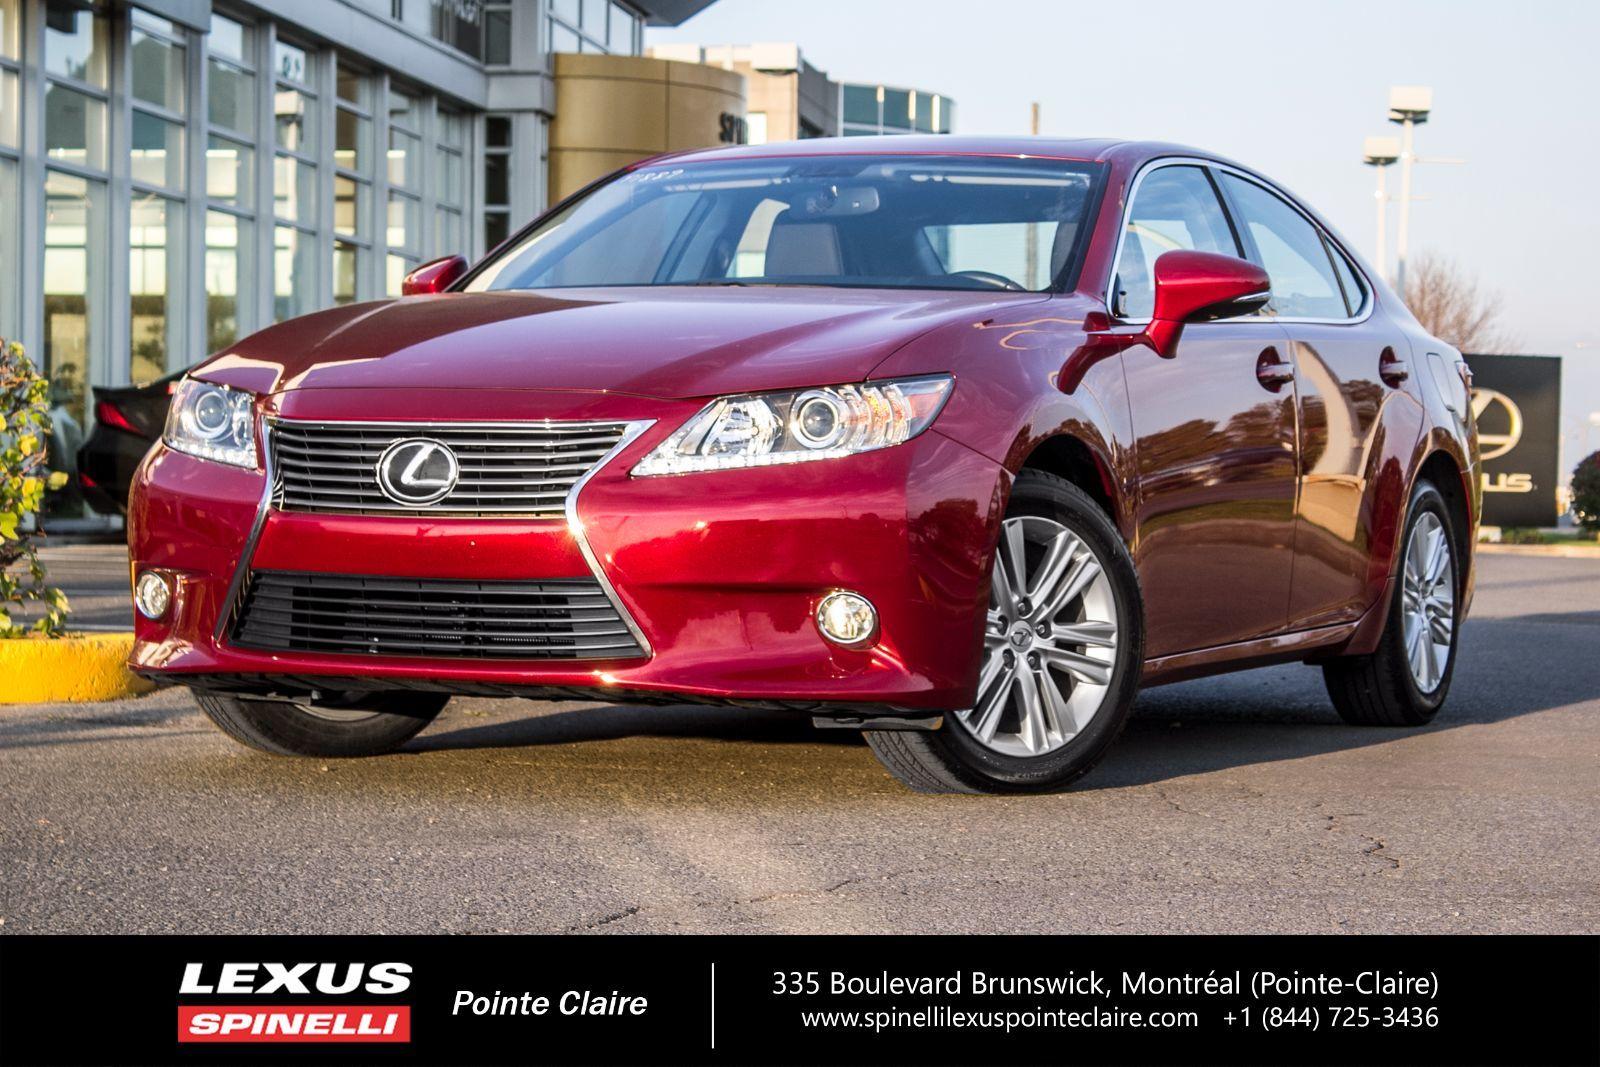 lexus sdn for listings full benzoauto es sale